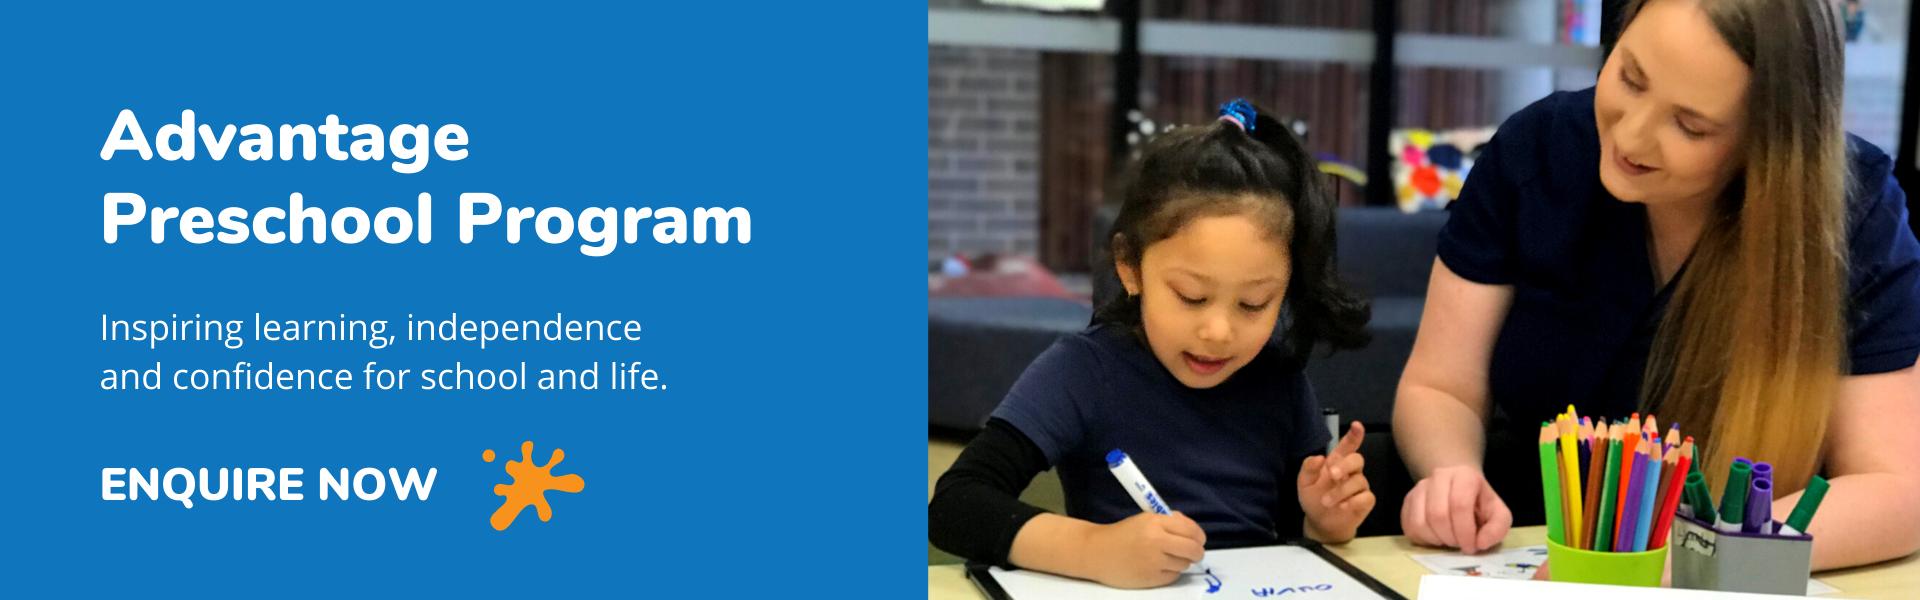 child-care-preschool-sydney-new